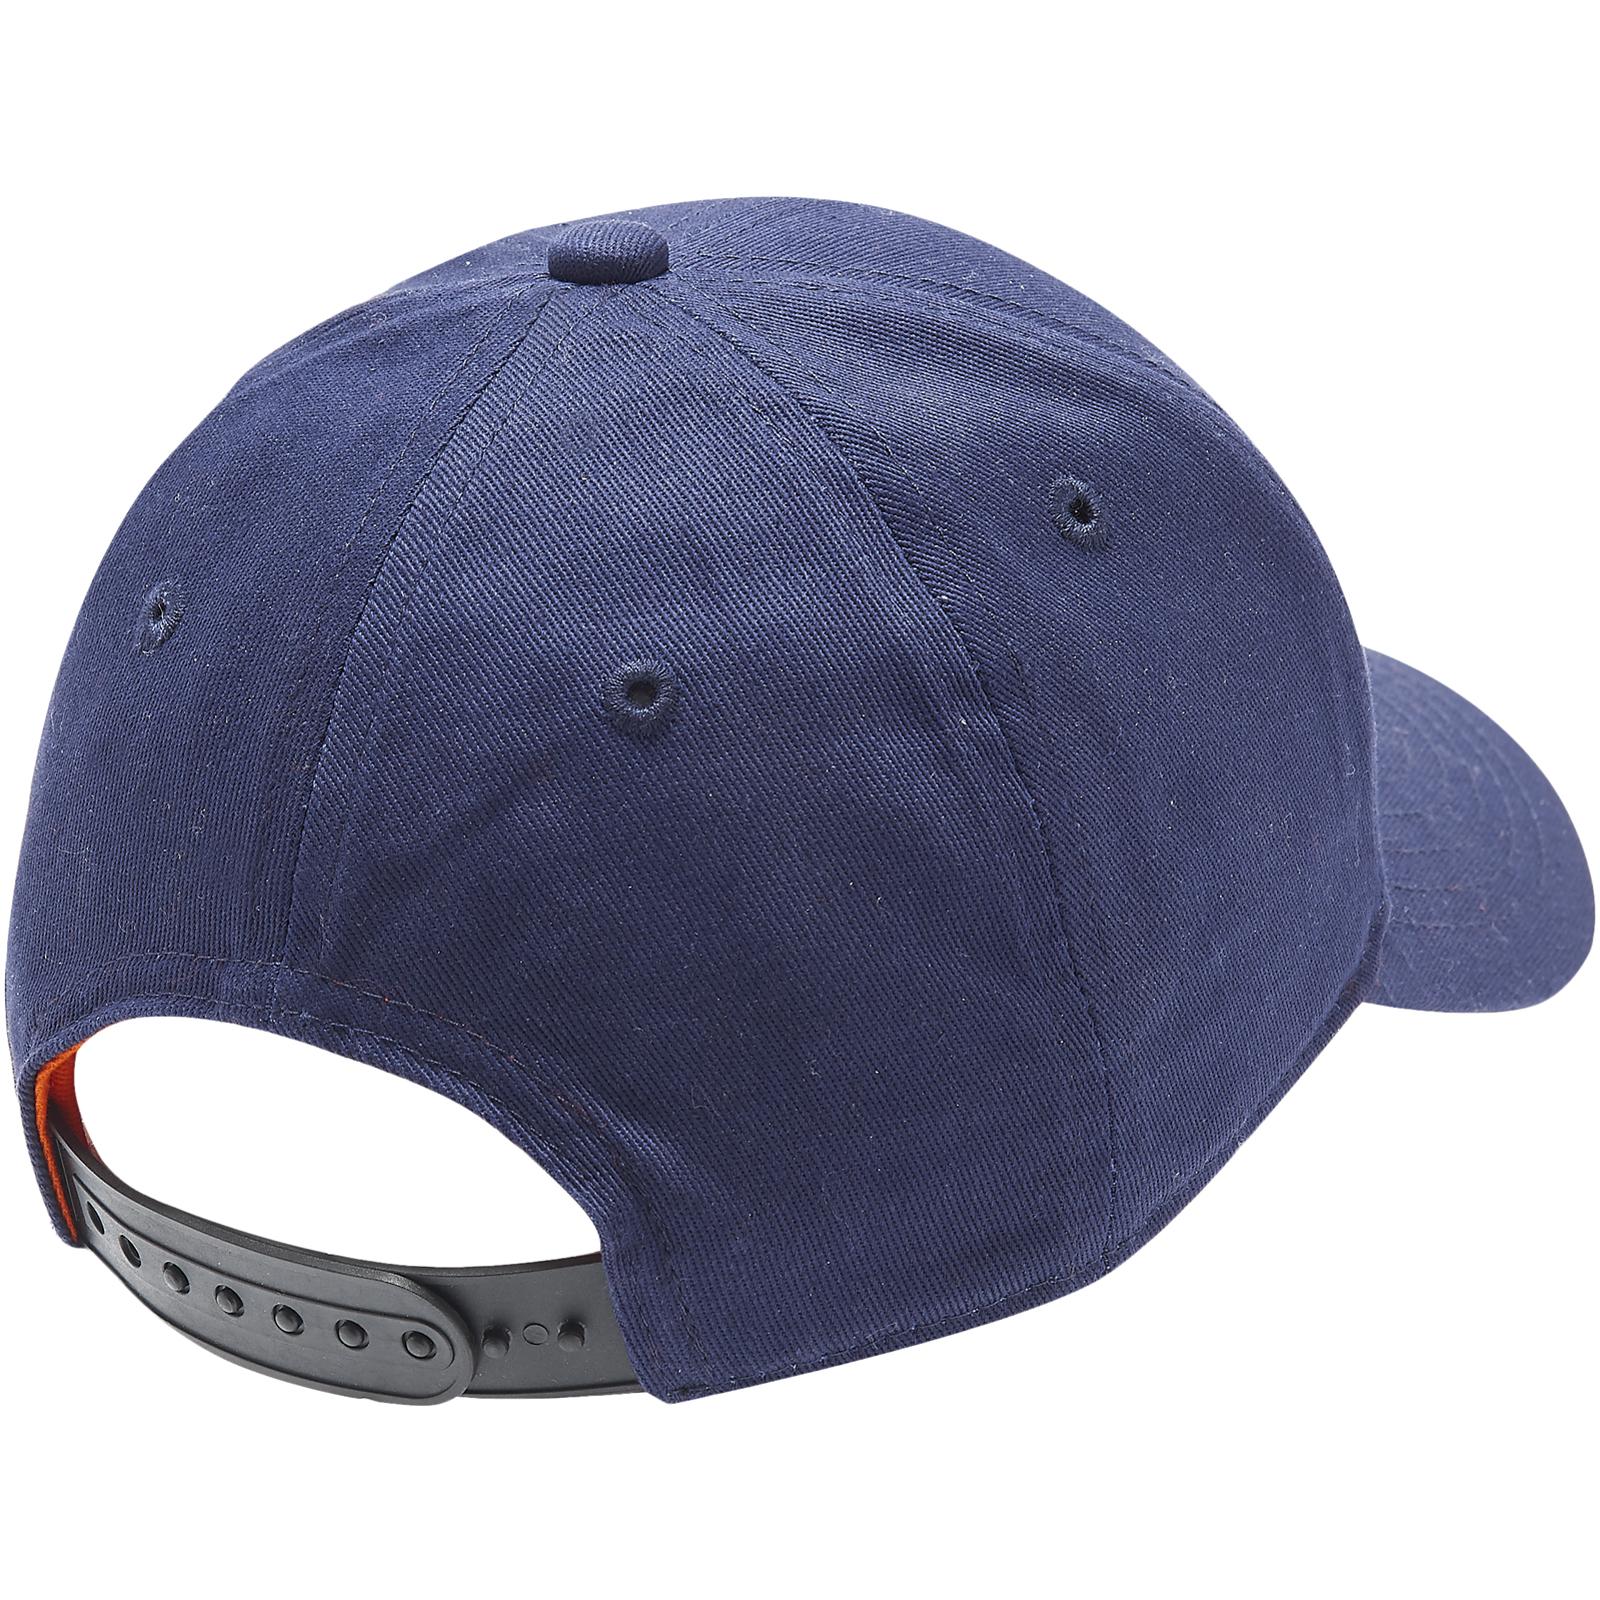 WORK CASUAL SPORTS LEISURE Mens Classic Cabin Boy  Adjustable Baseball Caps